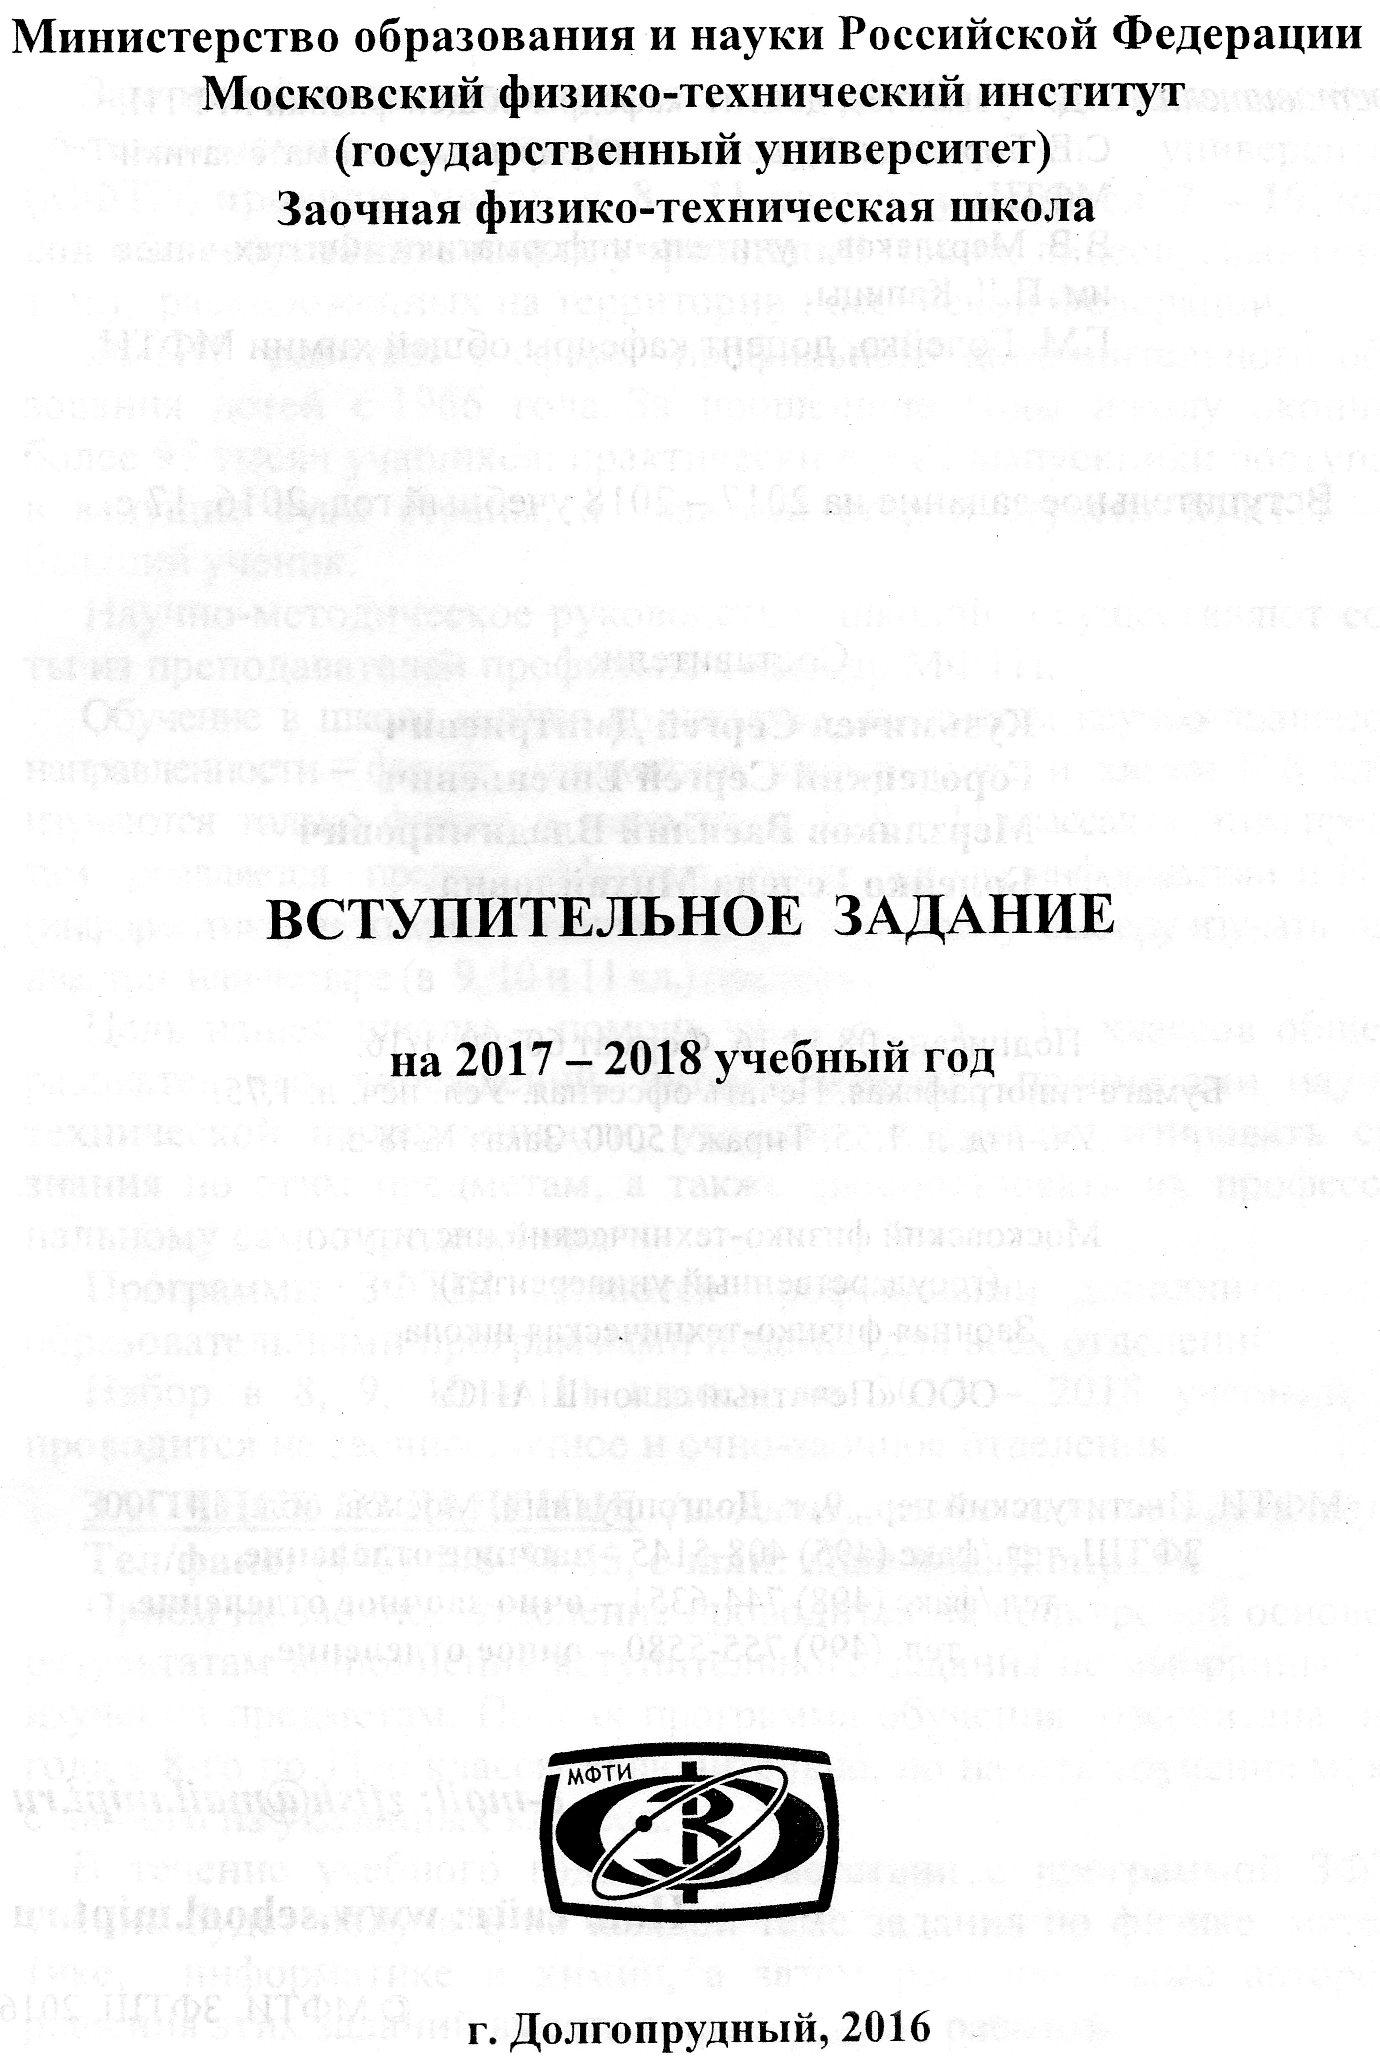 Зфтш при мфти задание 3 за 2017 год.8 класс